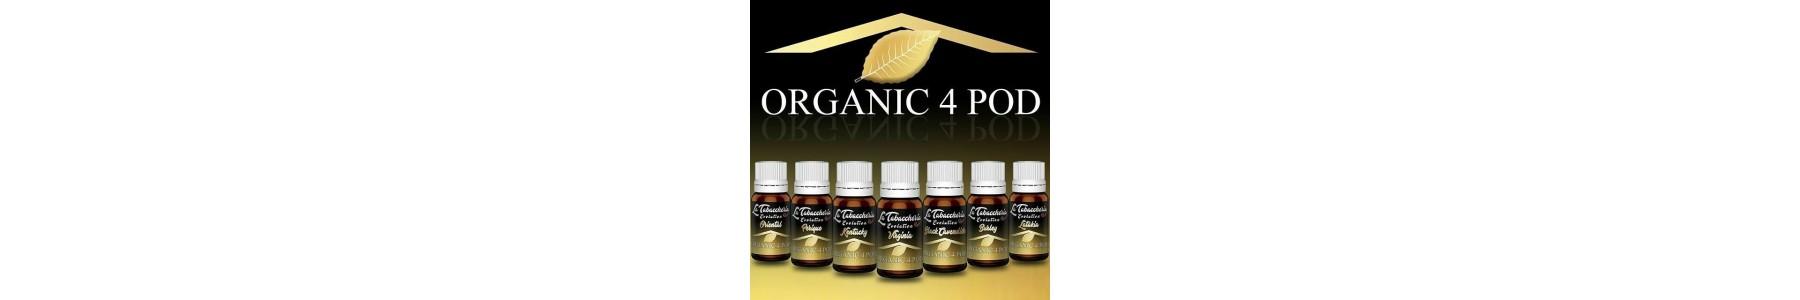 Organic 4 Pod